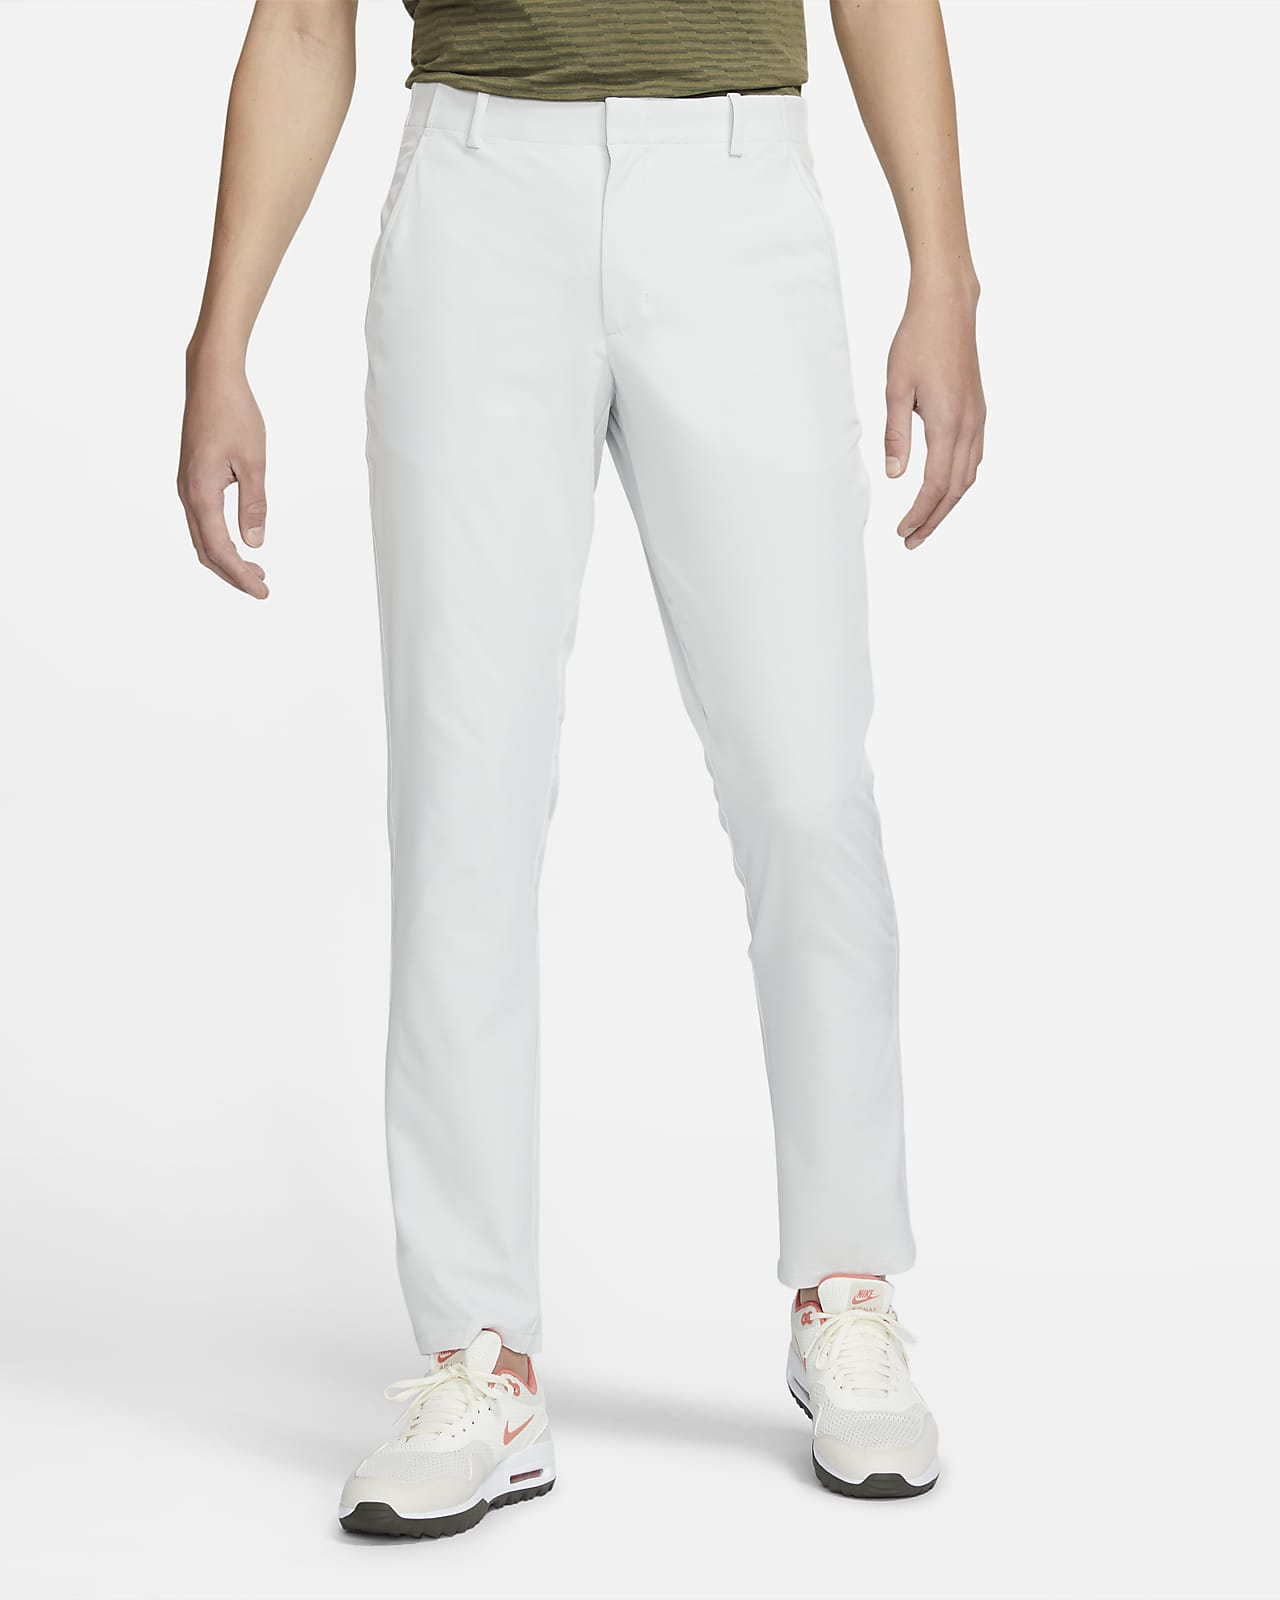 Nike Dri-FIT Vapor Men's Slim Fit Golf Pants